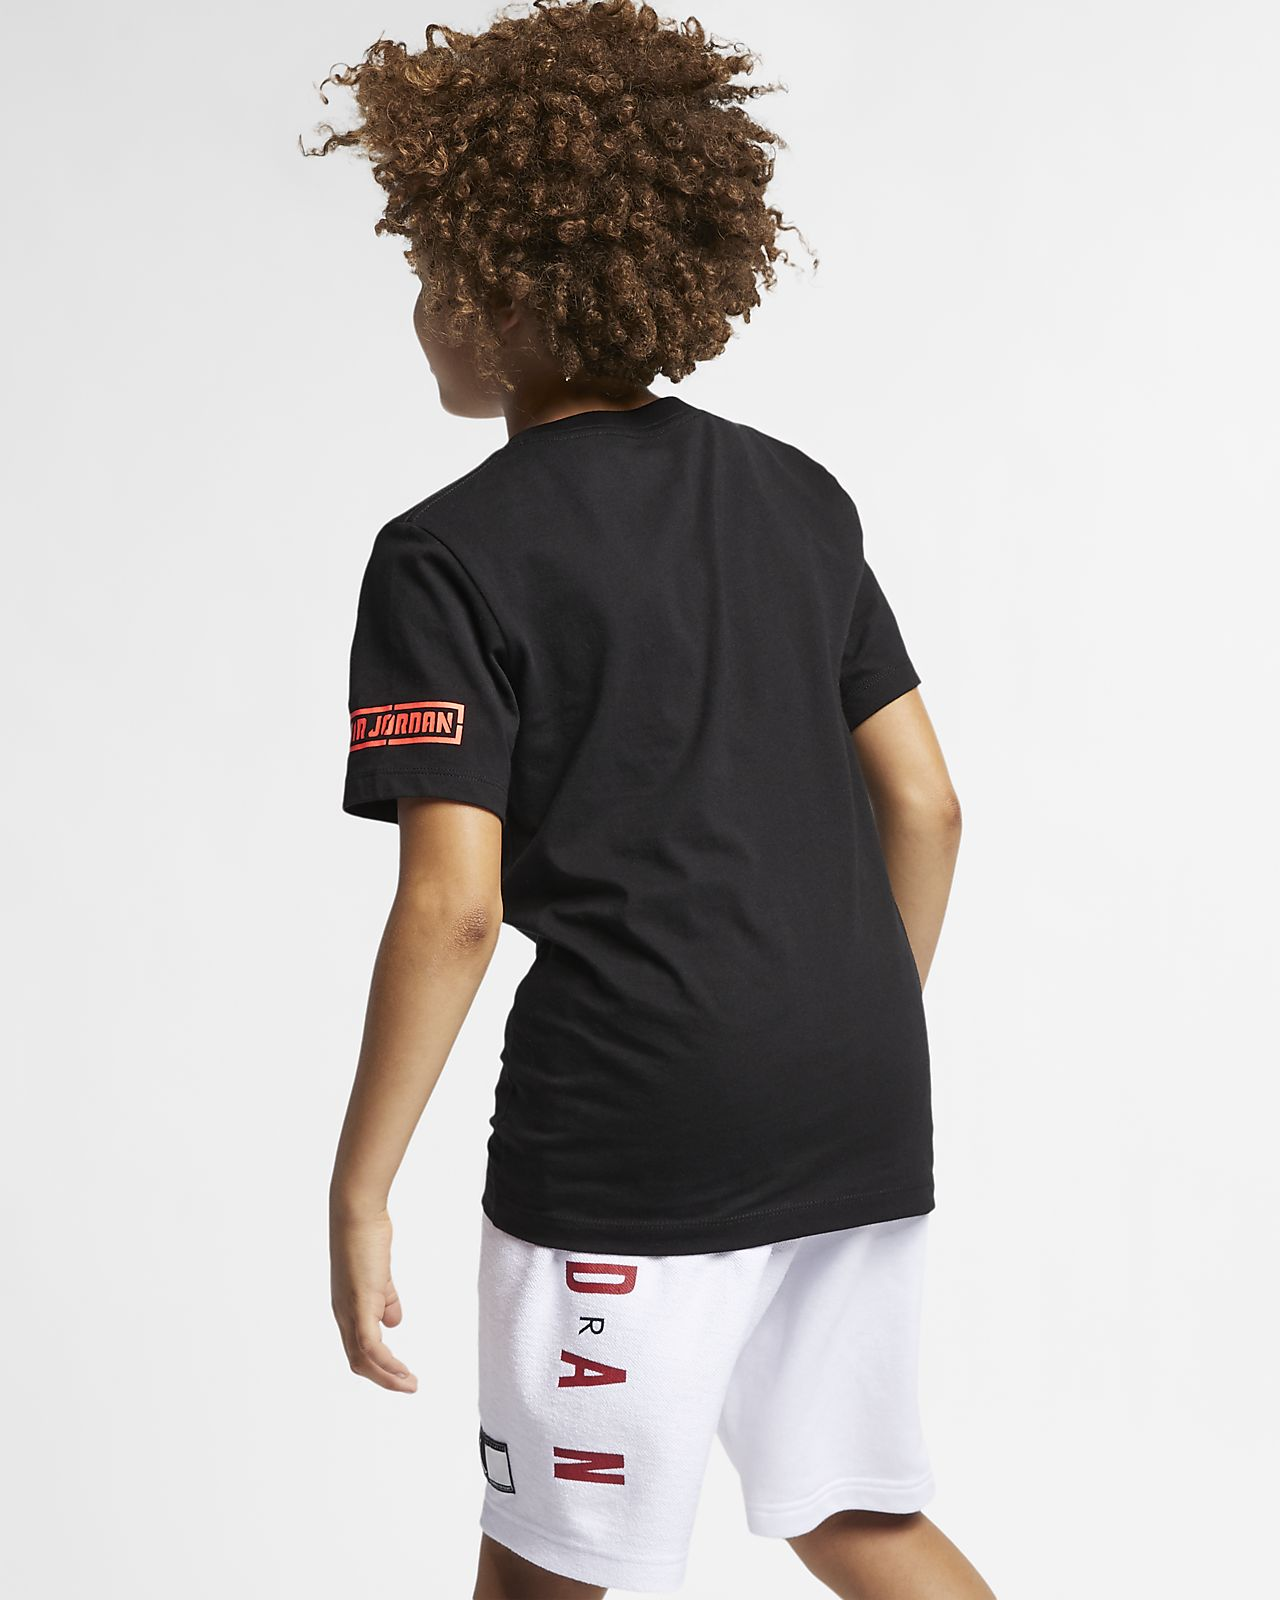 2d78de075ad Jordan City of Flight Older Kids' (Boys') T-Shirt. Nike.com GB